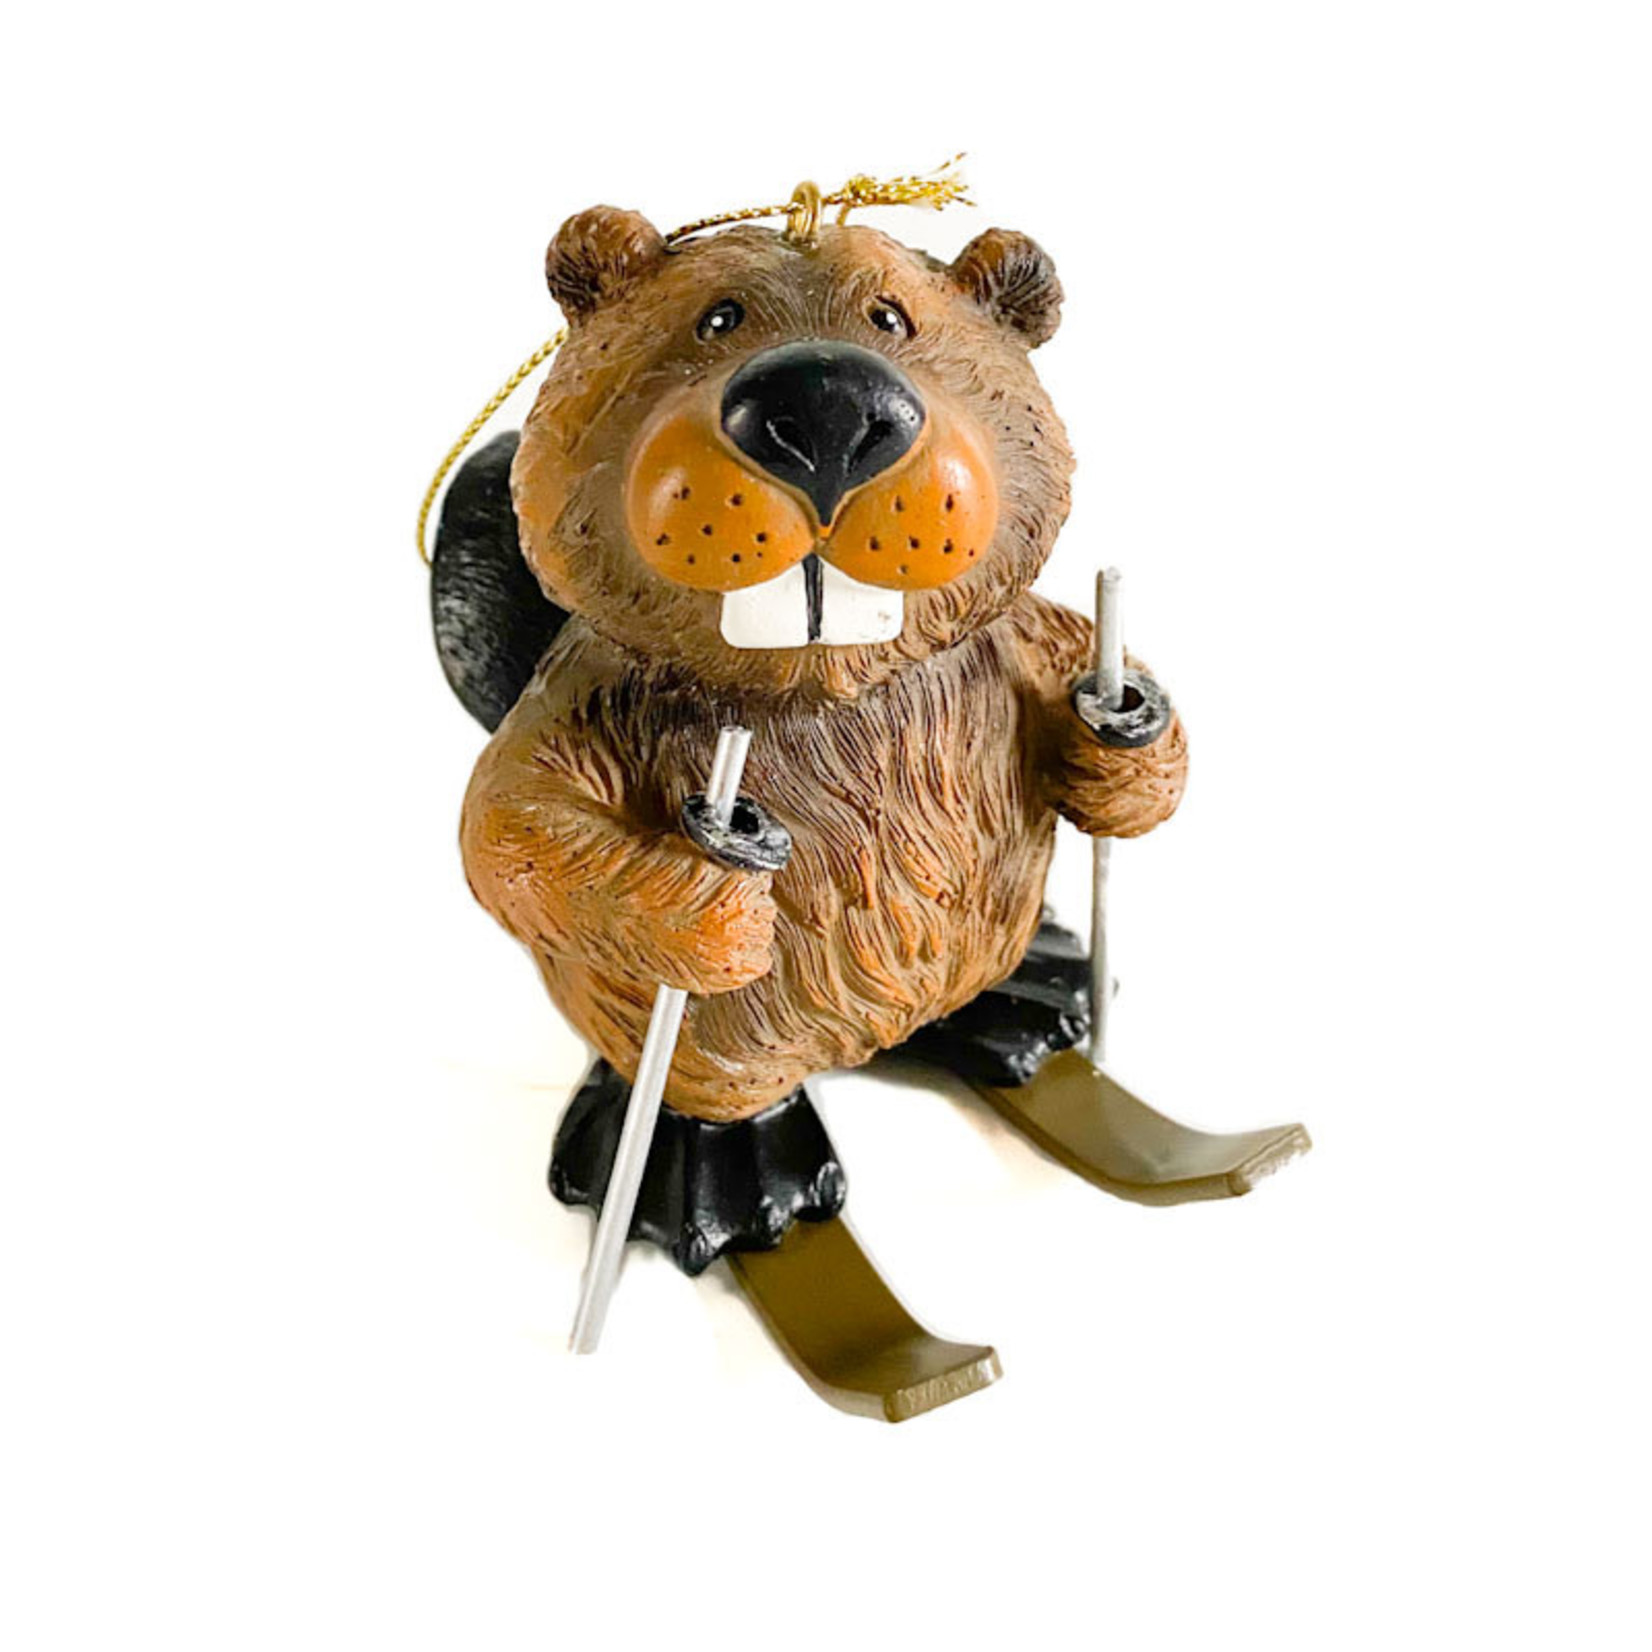 Ornament - Beaver on Skis